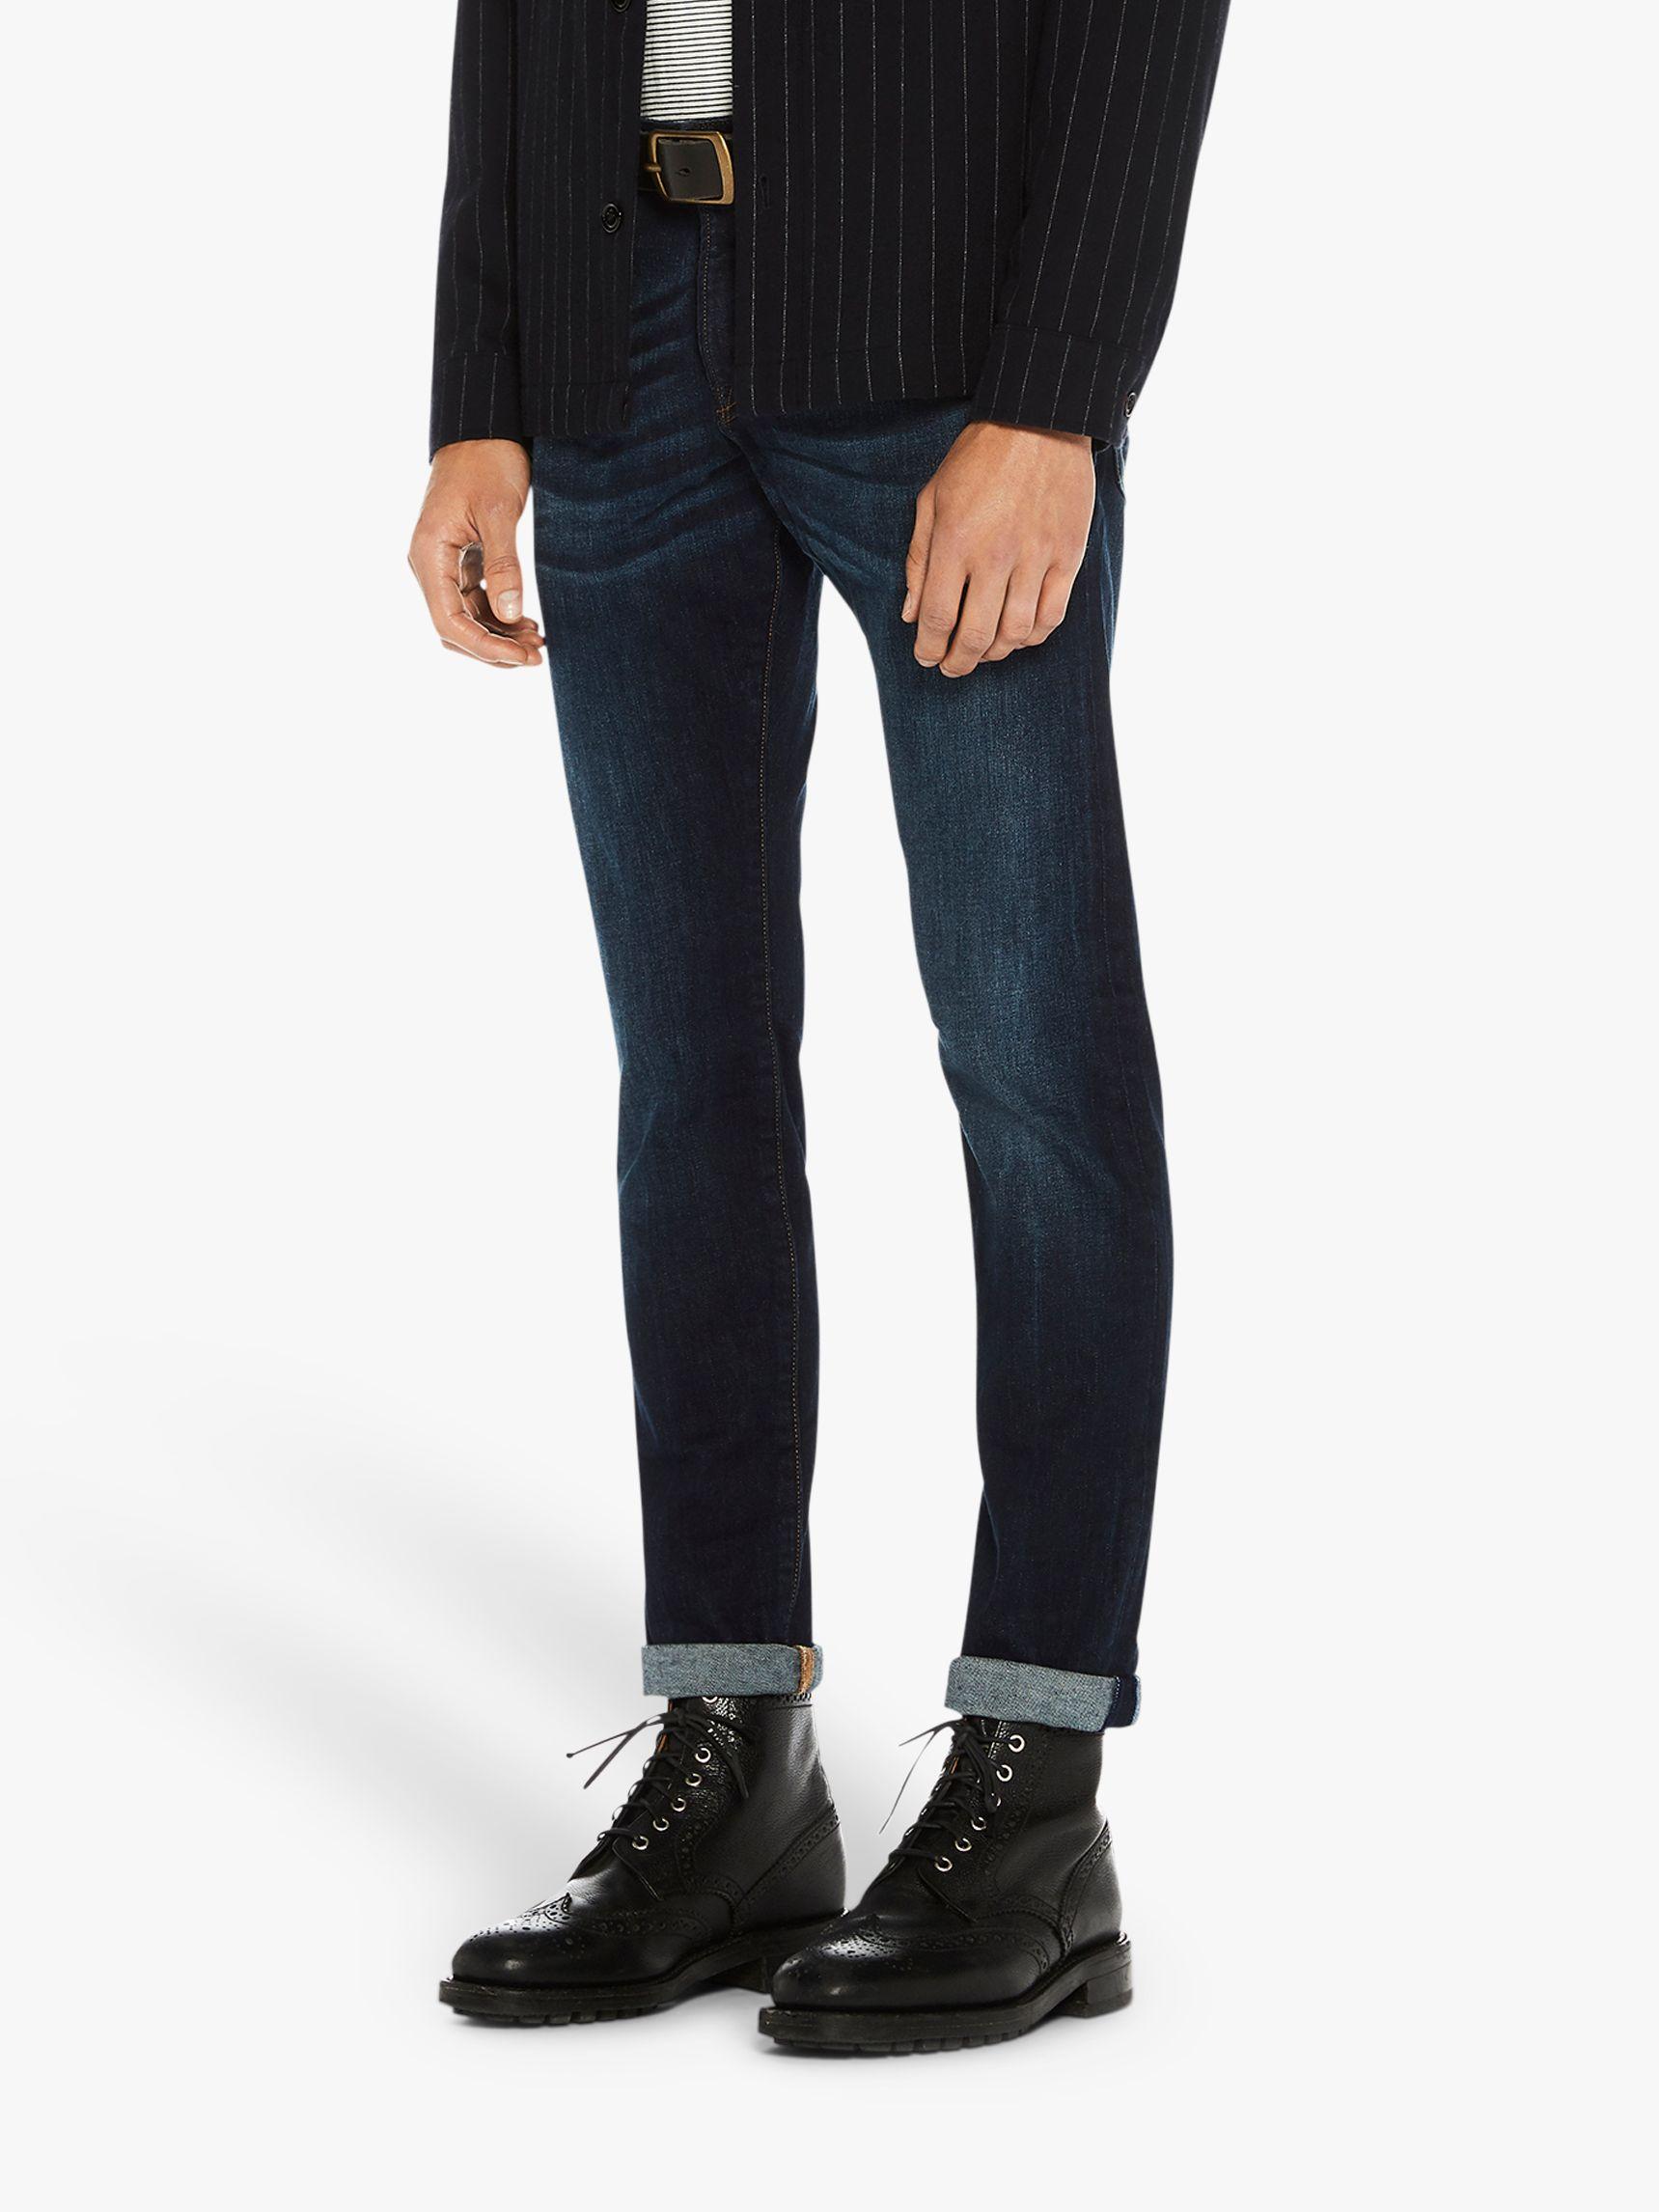 Scotch & Soda Scotch & Soda Ralston Regular Slim Fit Jeans, Blue